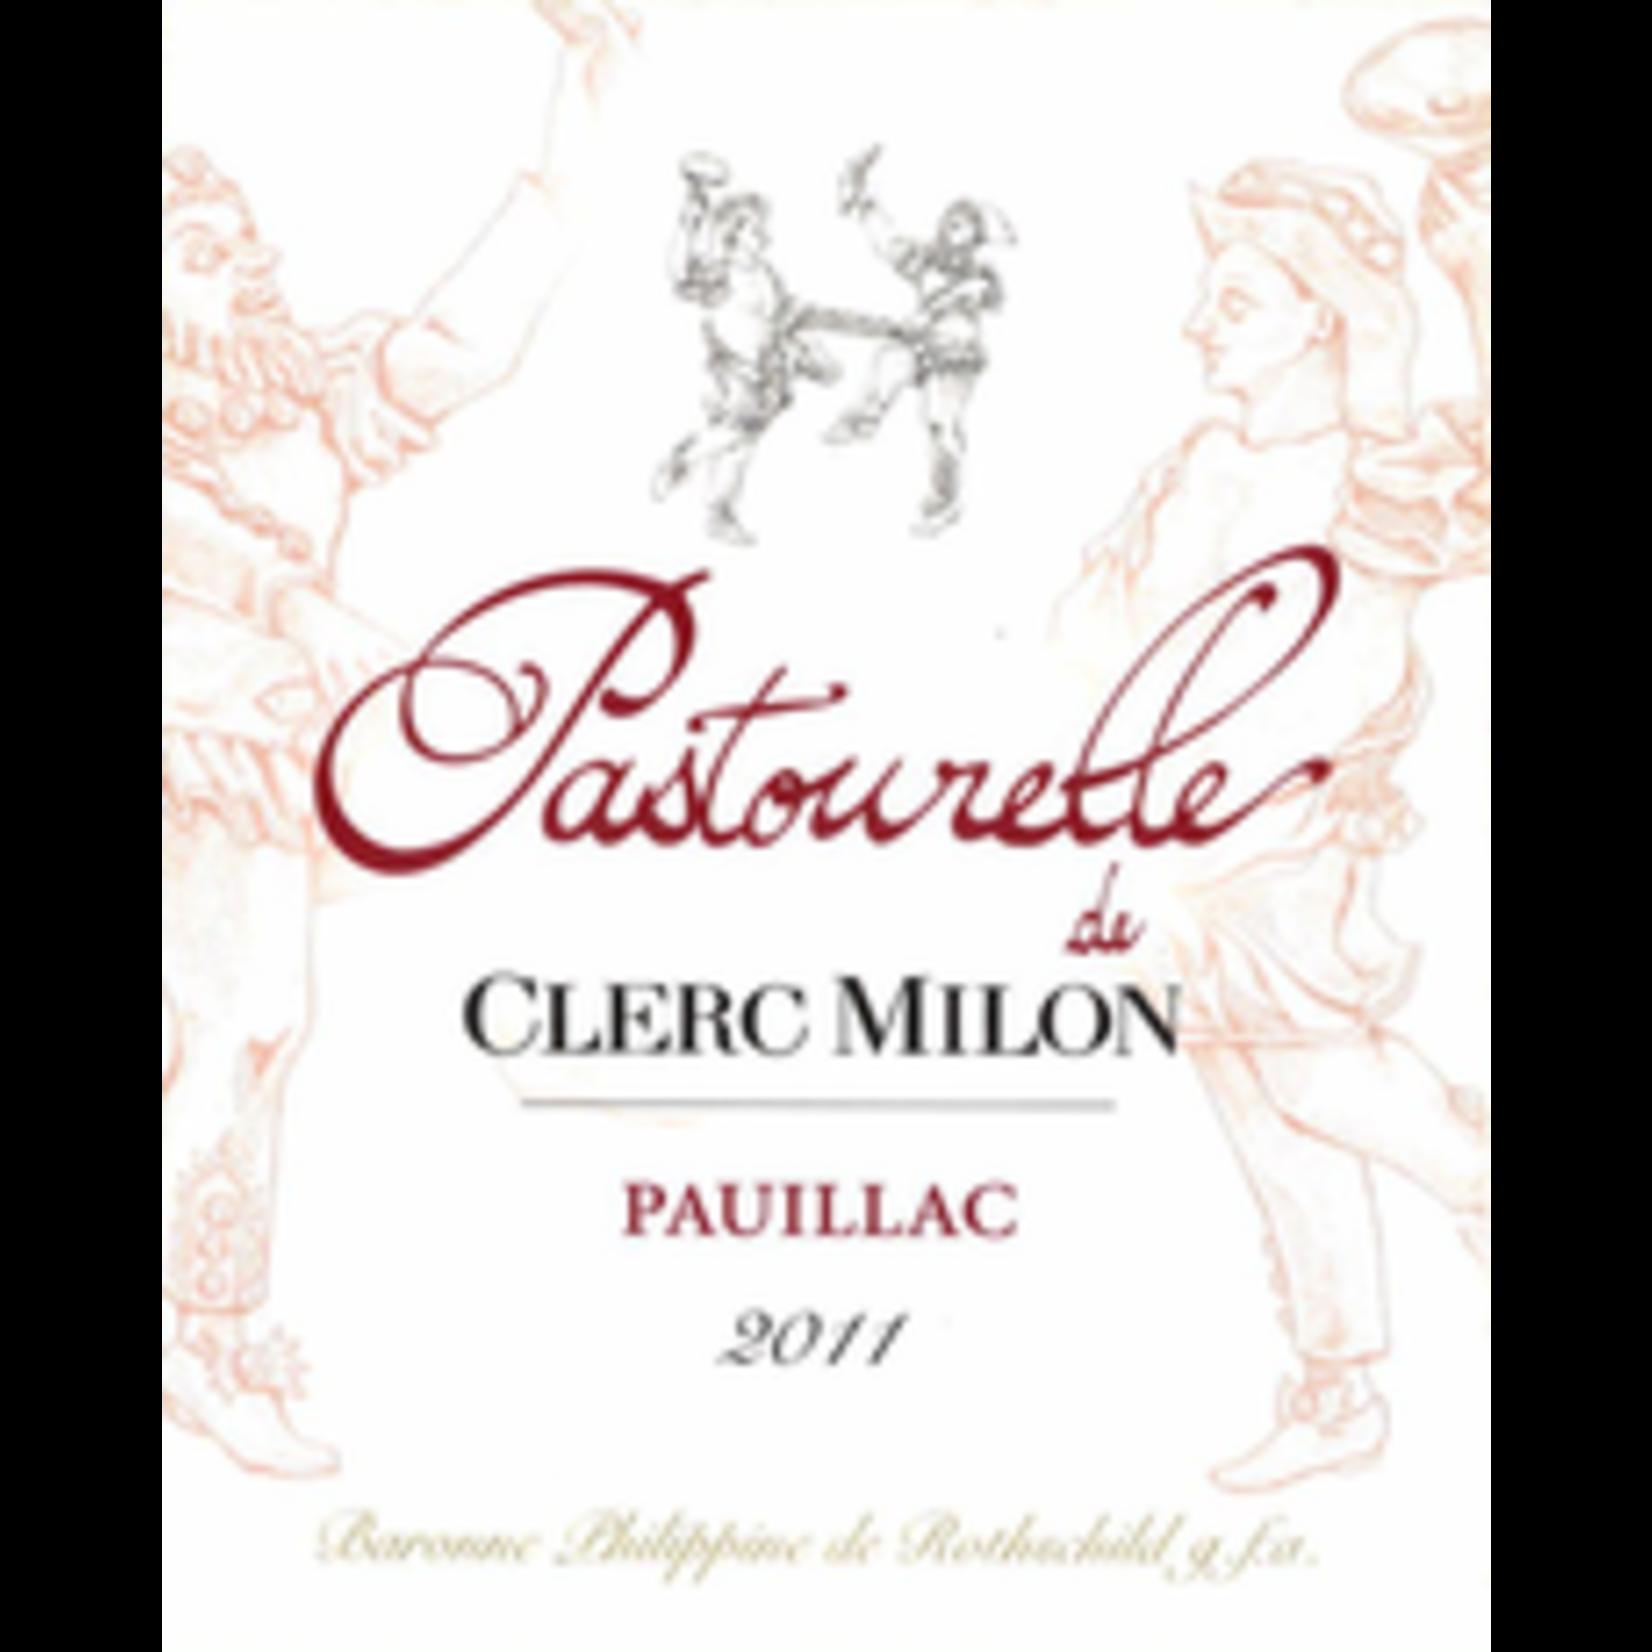 Wine Pastourelle De Clerc Milon 2011